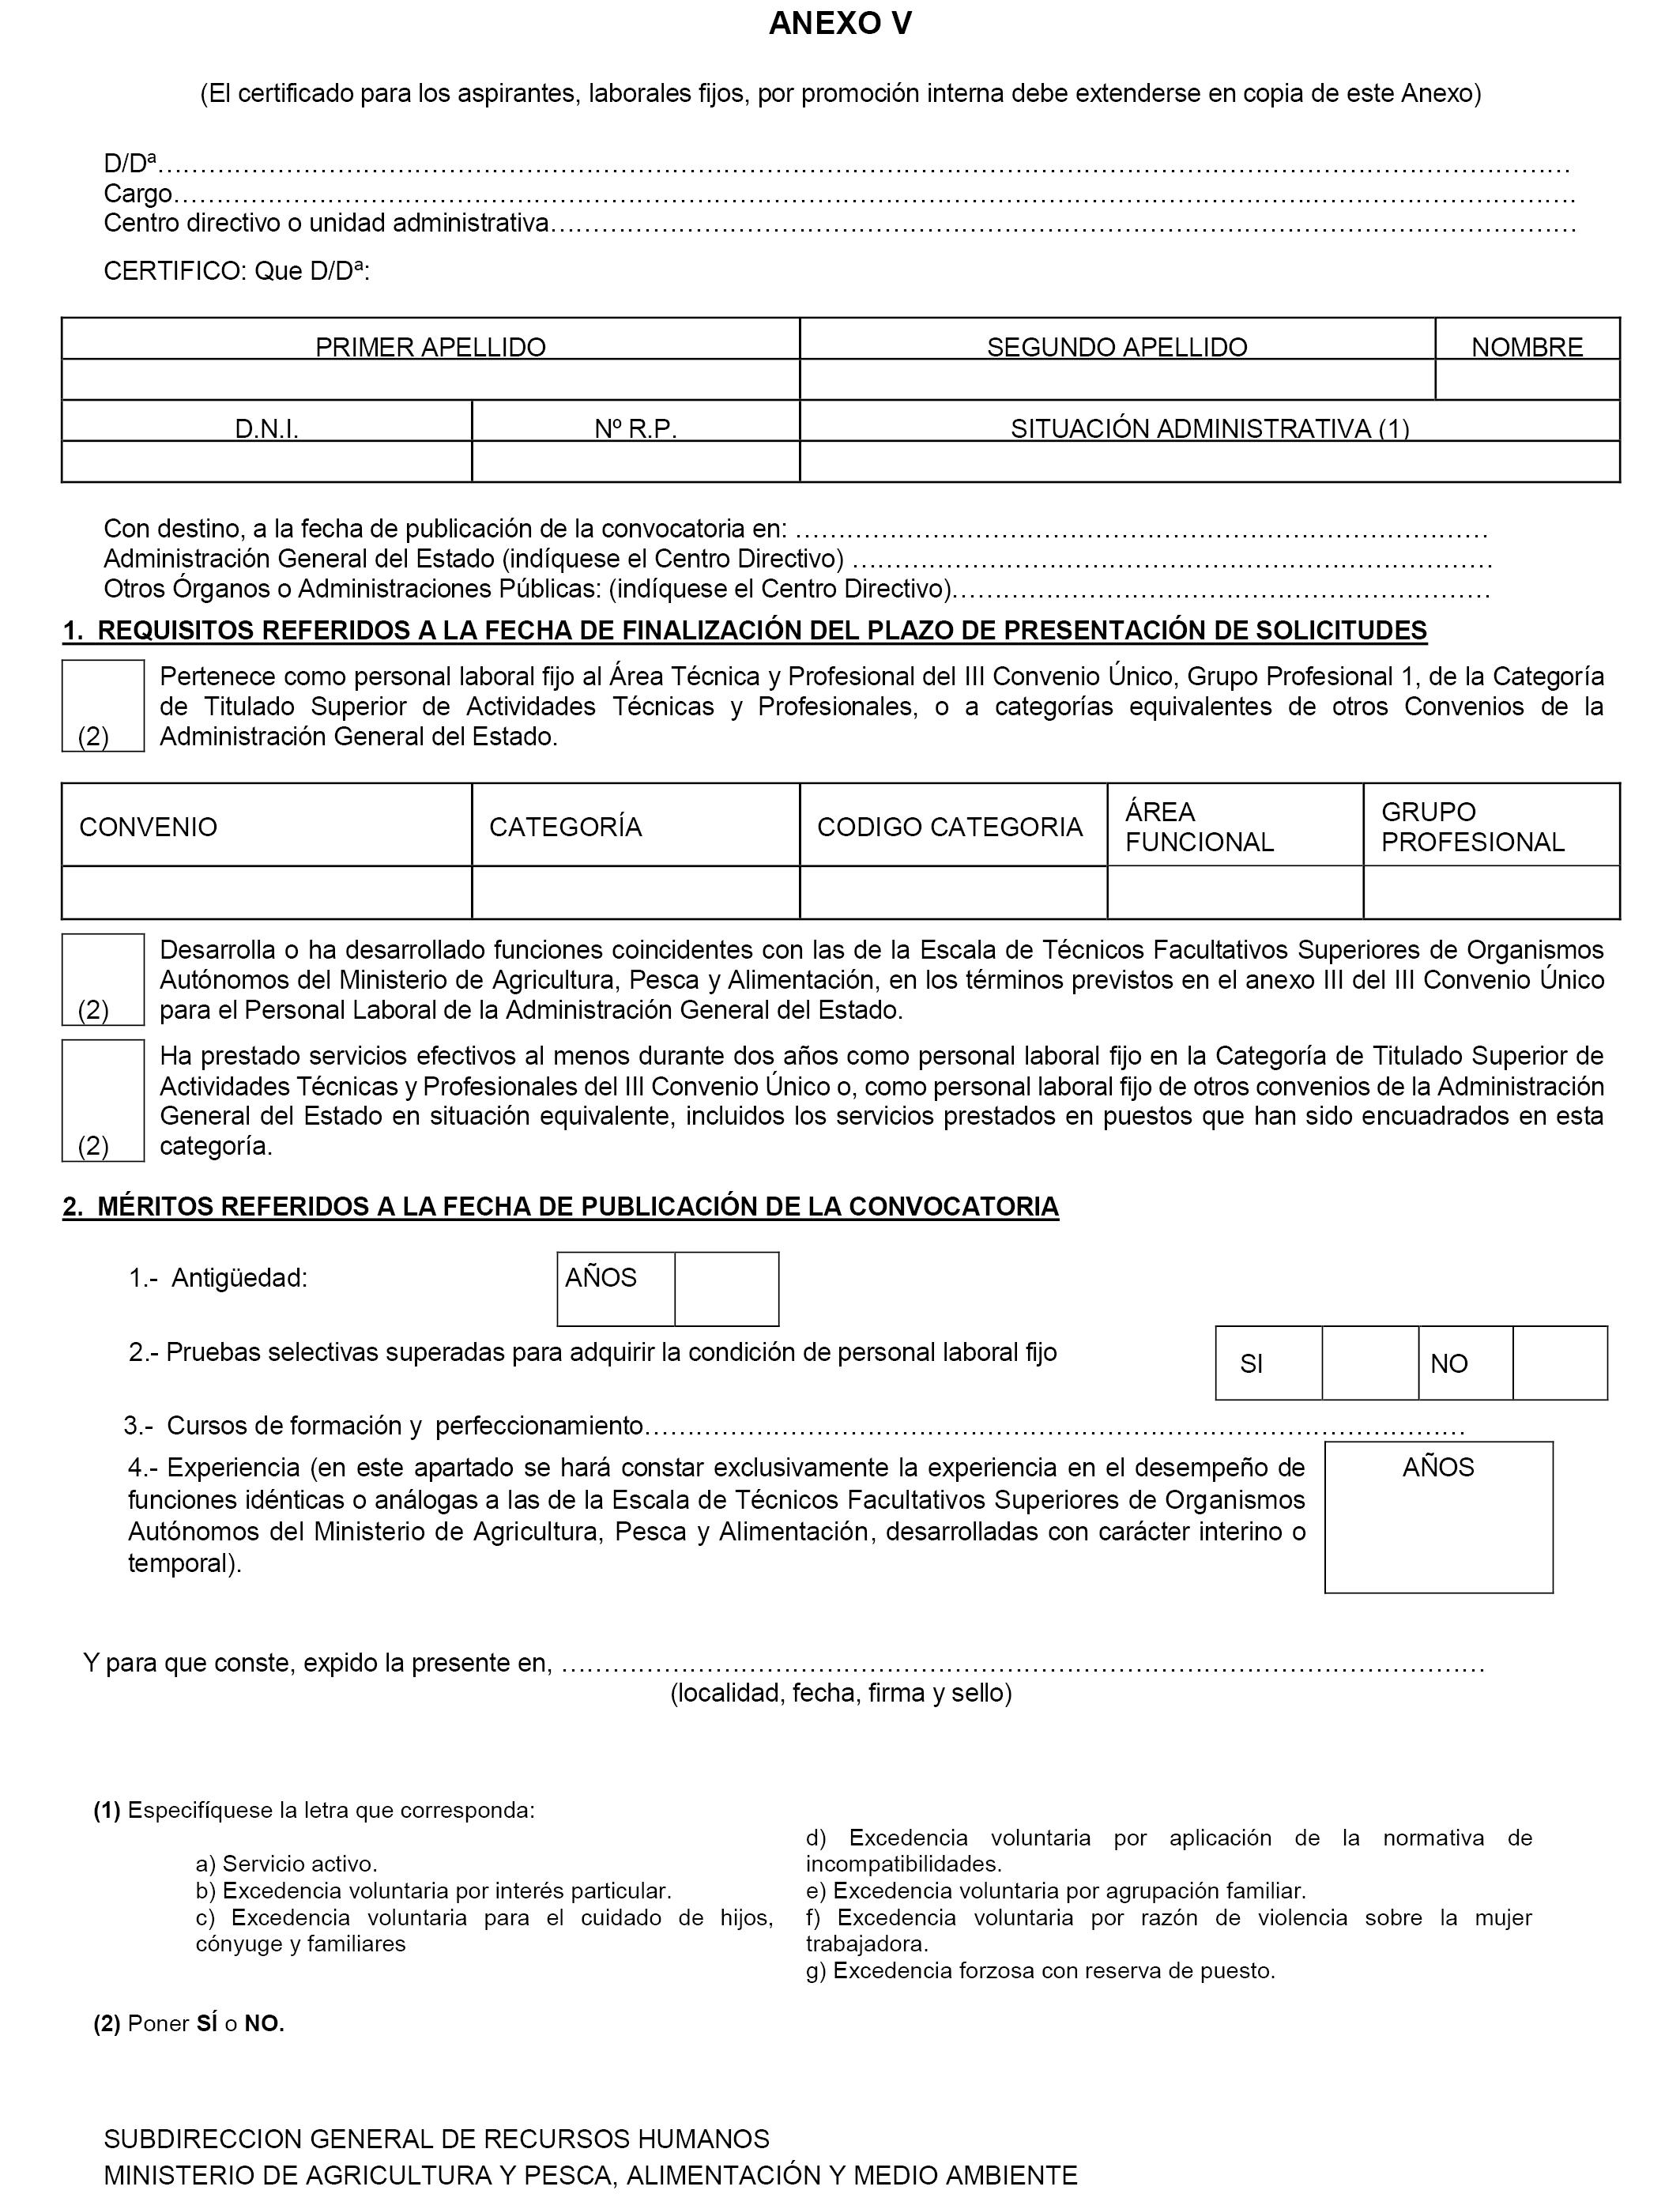 BOE.es - Documento BOE-A-2017-14636